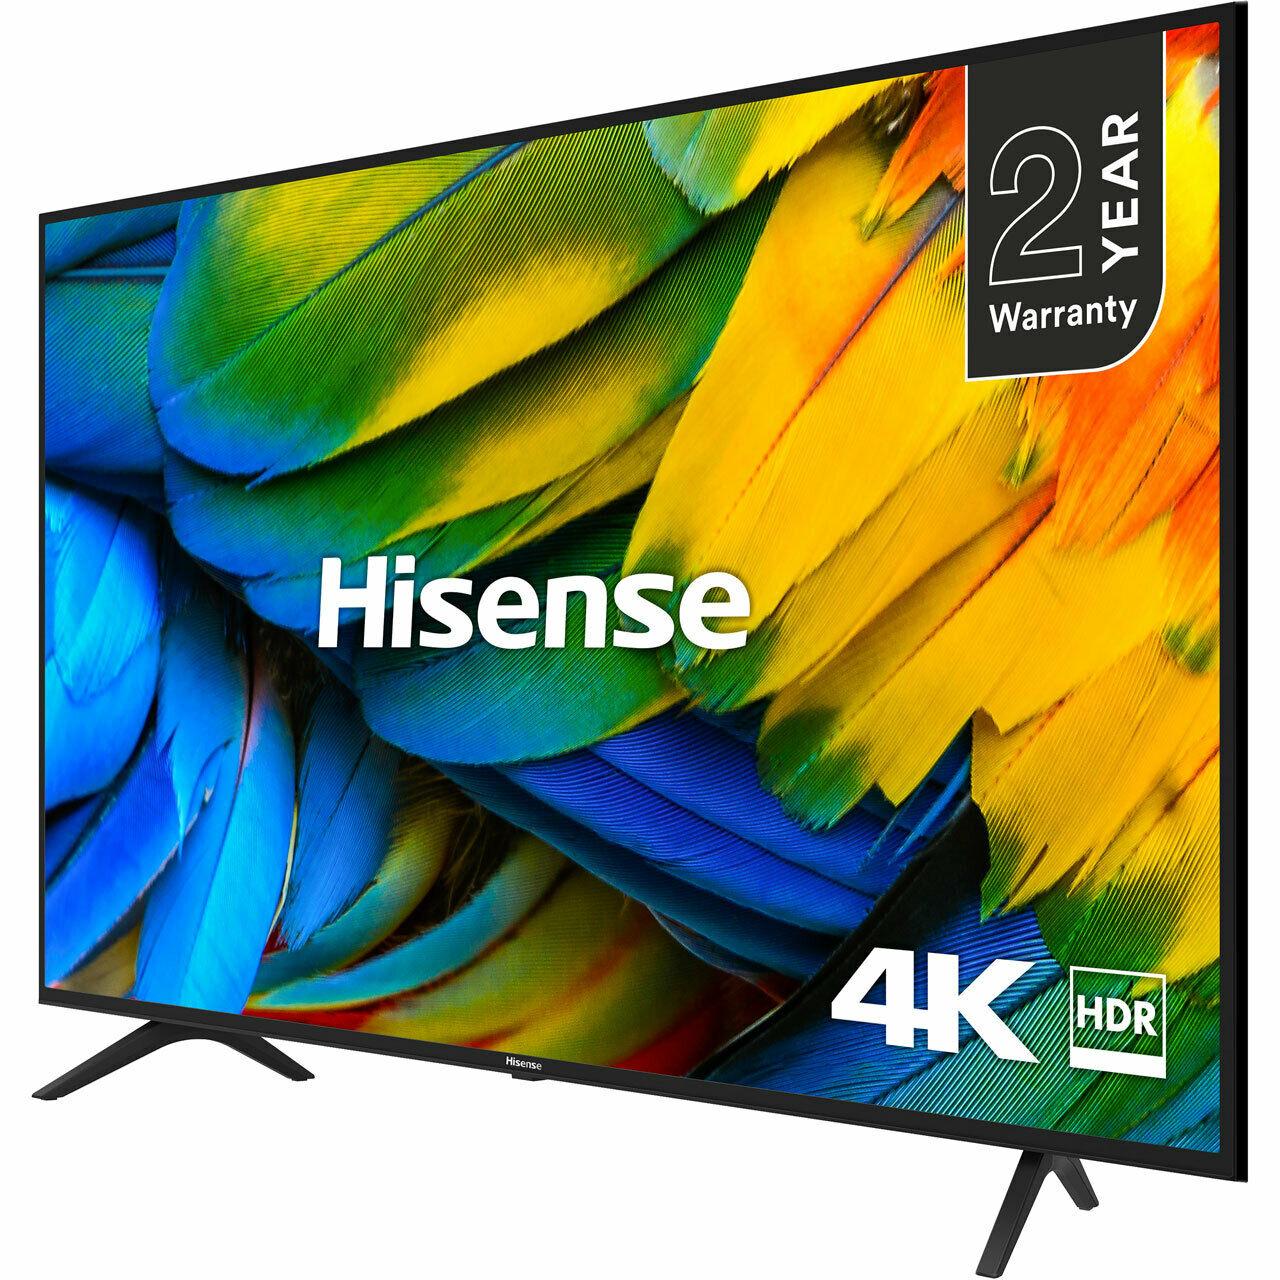 H43B7100UK B7100 43 Inch TV Smart 4K Ultra HD LED Freeview HD 3 HDMI £224.10 with code @ AO ebay